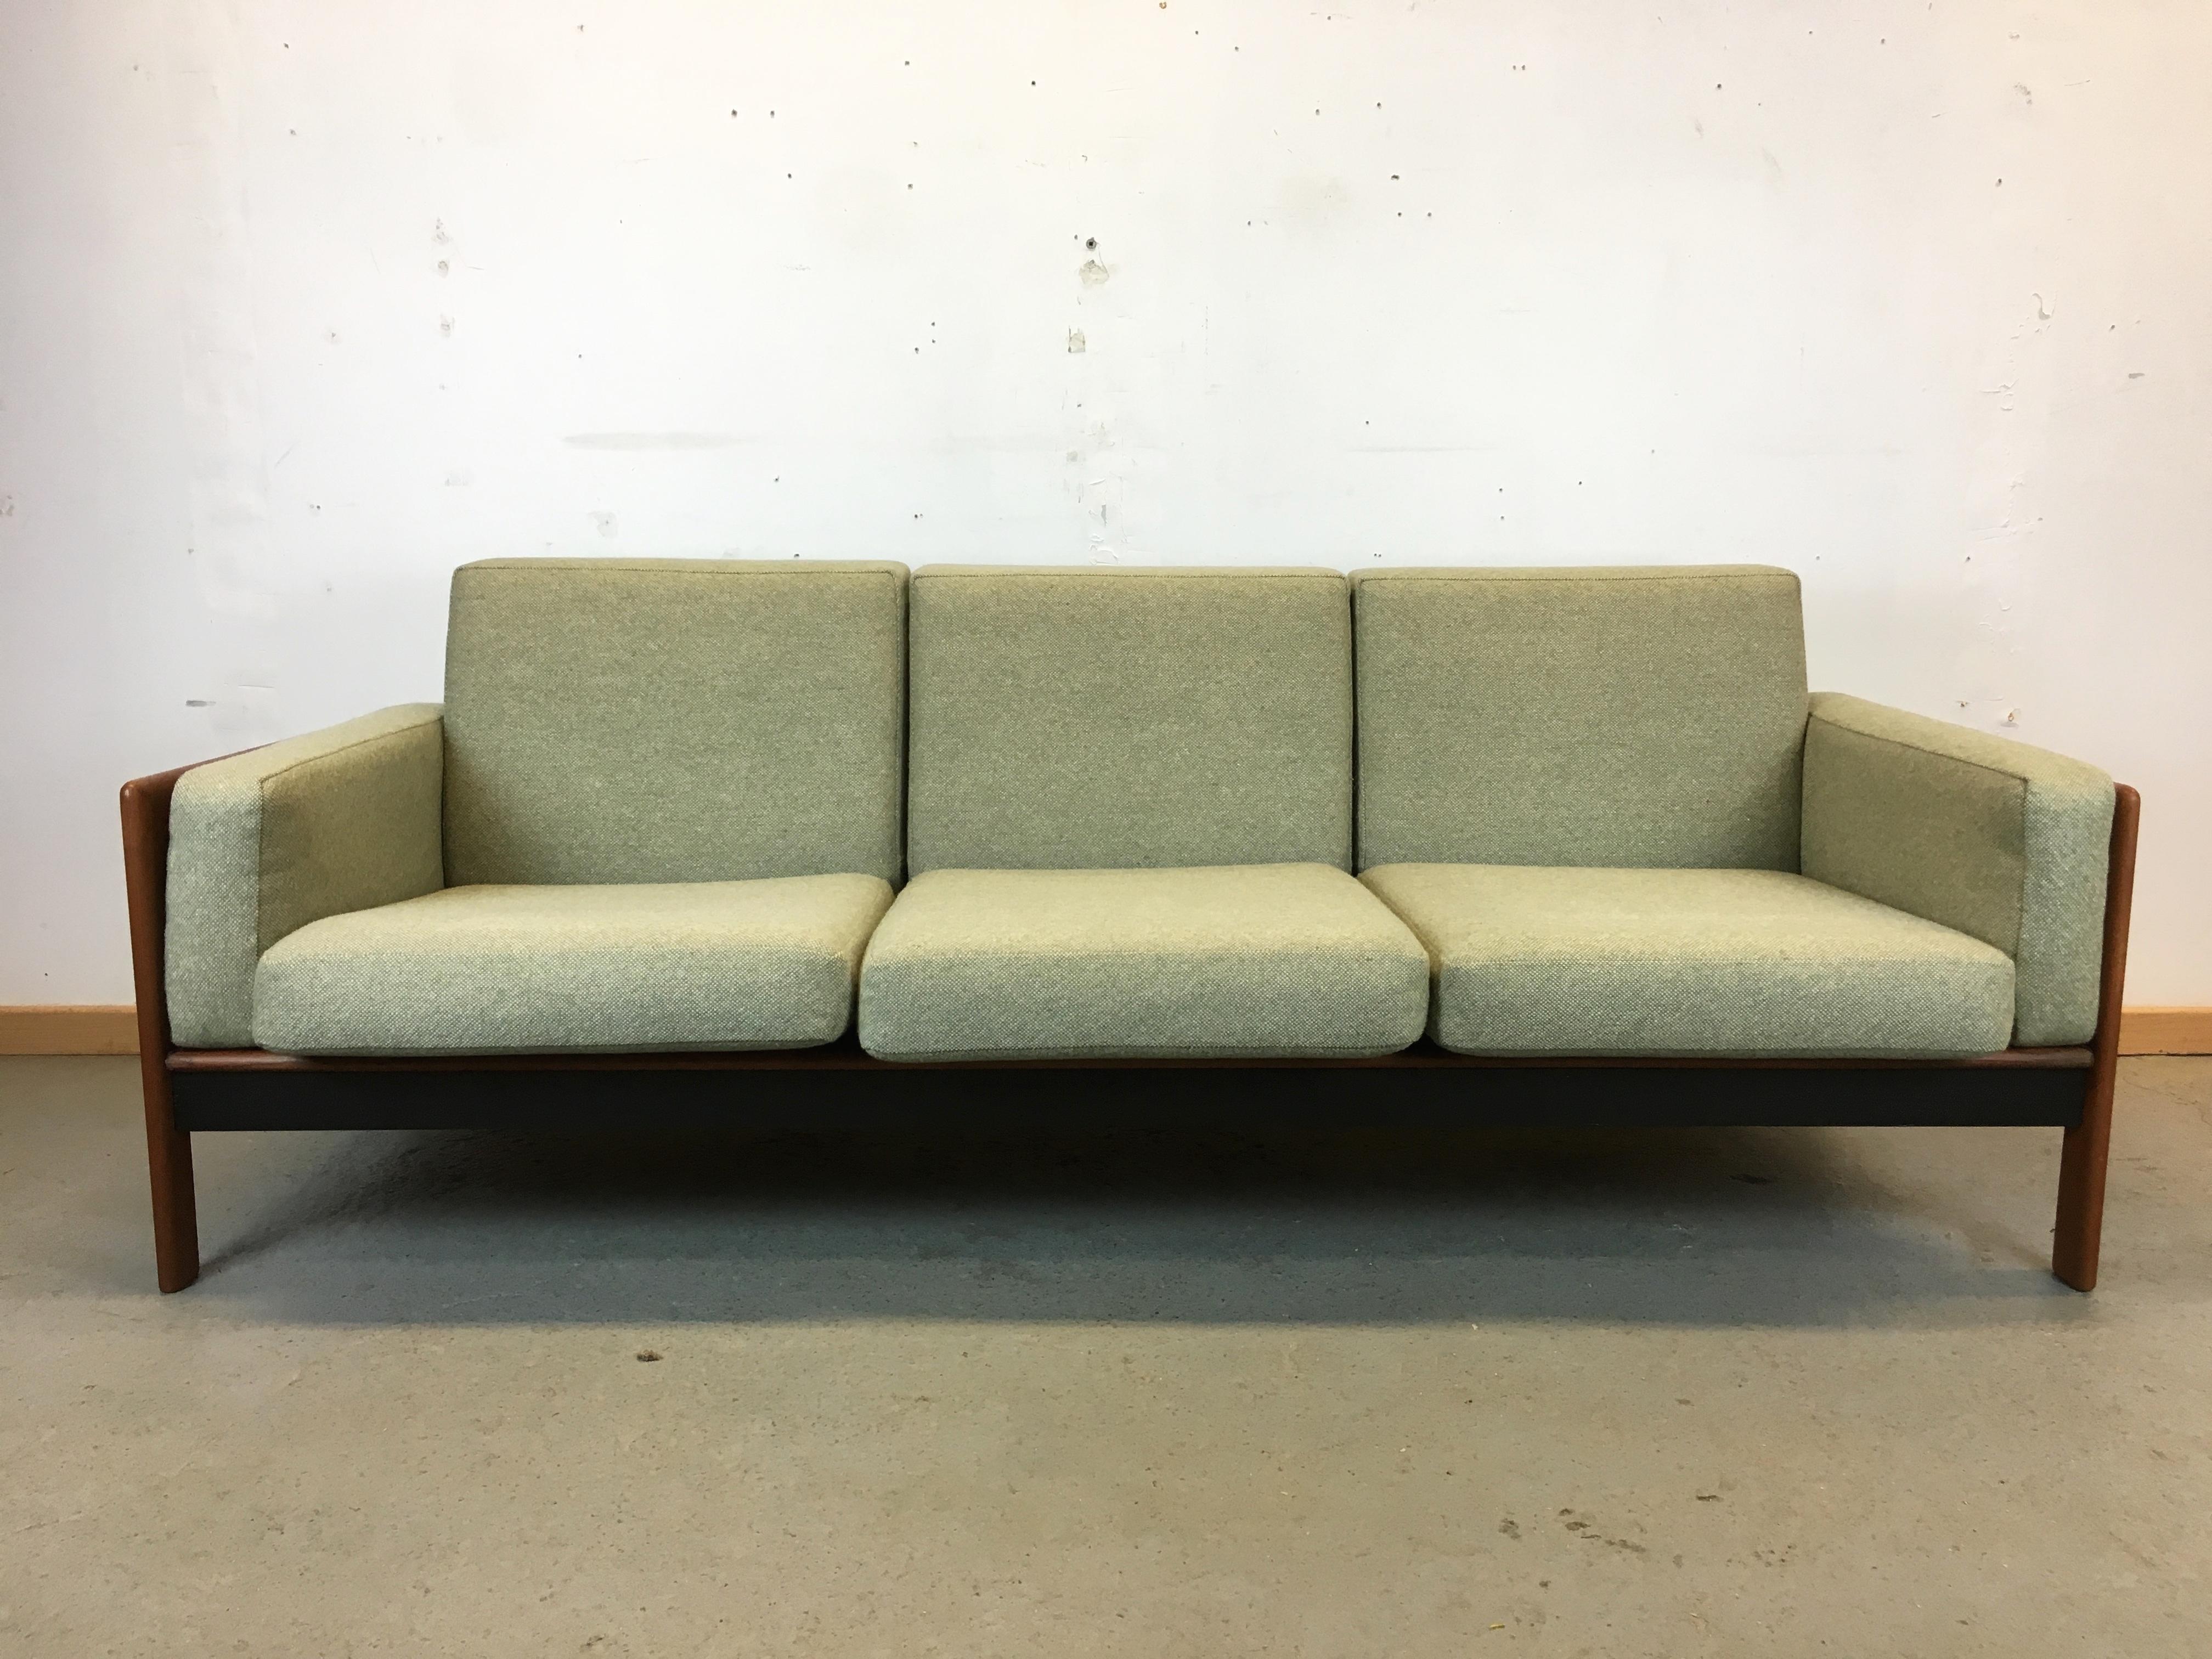 canap scandinave ann e 60 vintage sofa danish mid century. Black Bedroom Furniture Sets. Home Design Ideas